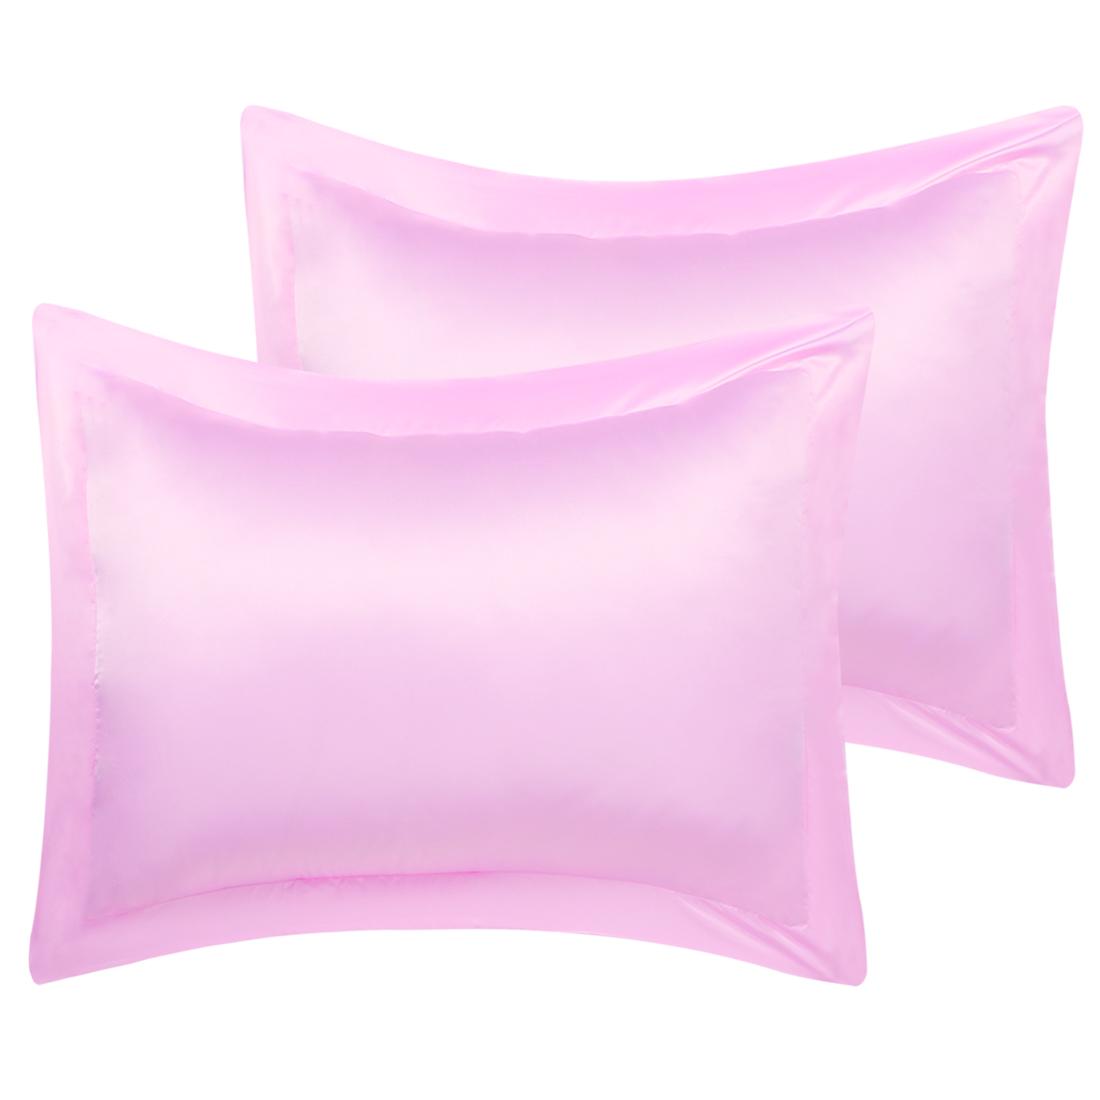 2 Pcs Pink Pillow Shams Satin Pillow Cases Standard Oxford Pillowcases